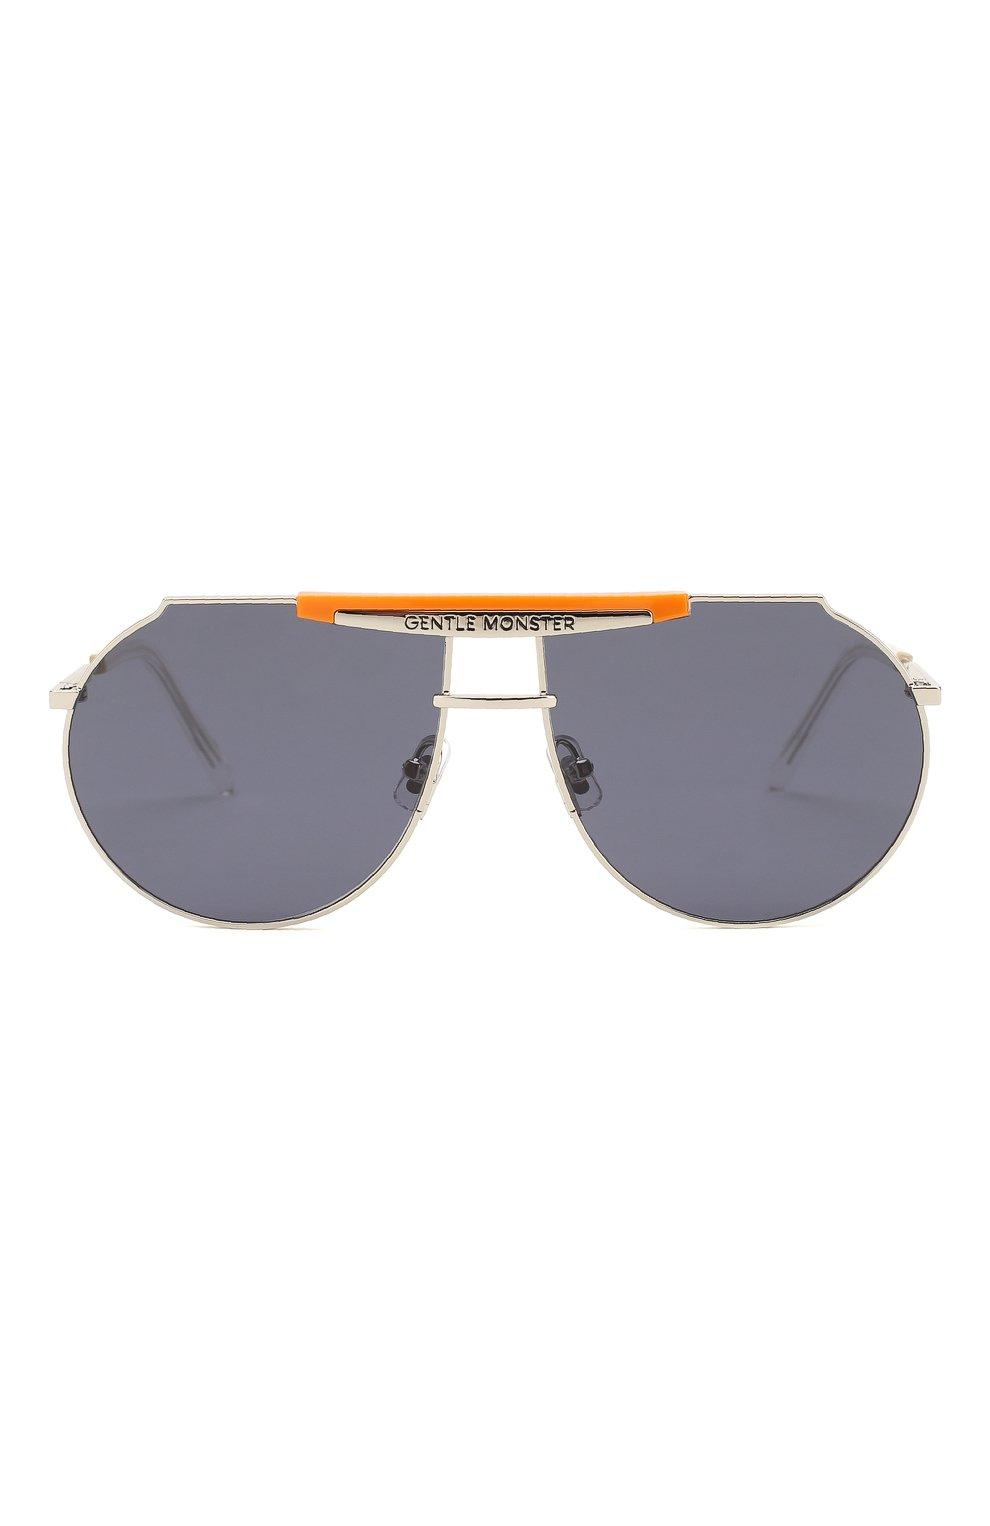 Женские солнцезащитные очки GENTLE MONSTER синего цвета, арт. T0MB0E 0R1 | Фото 4